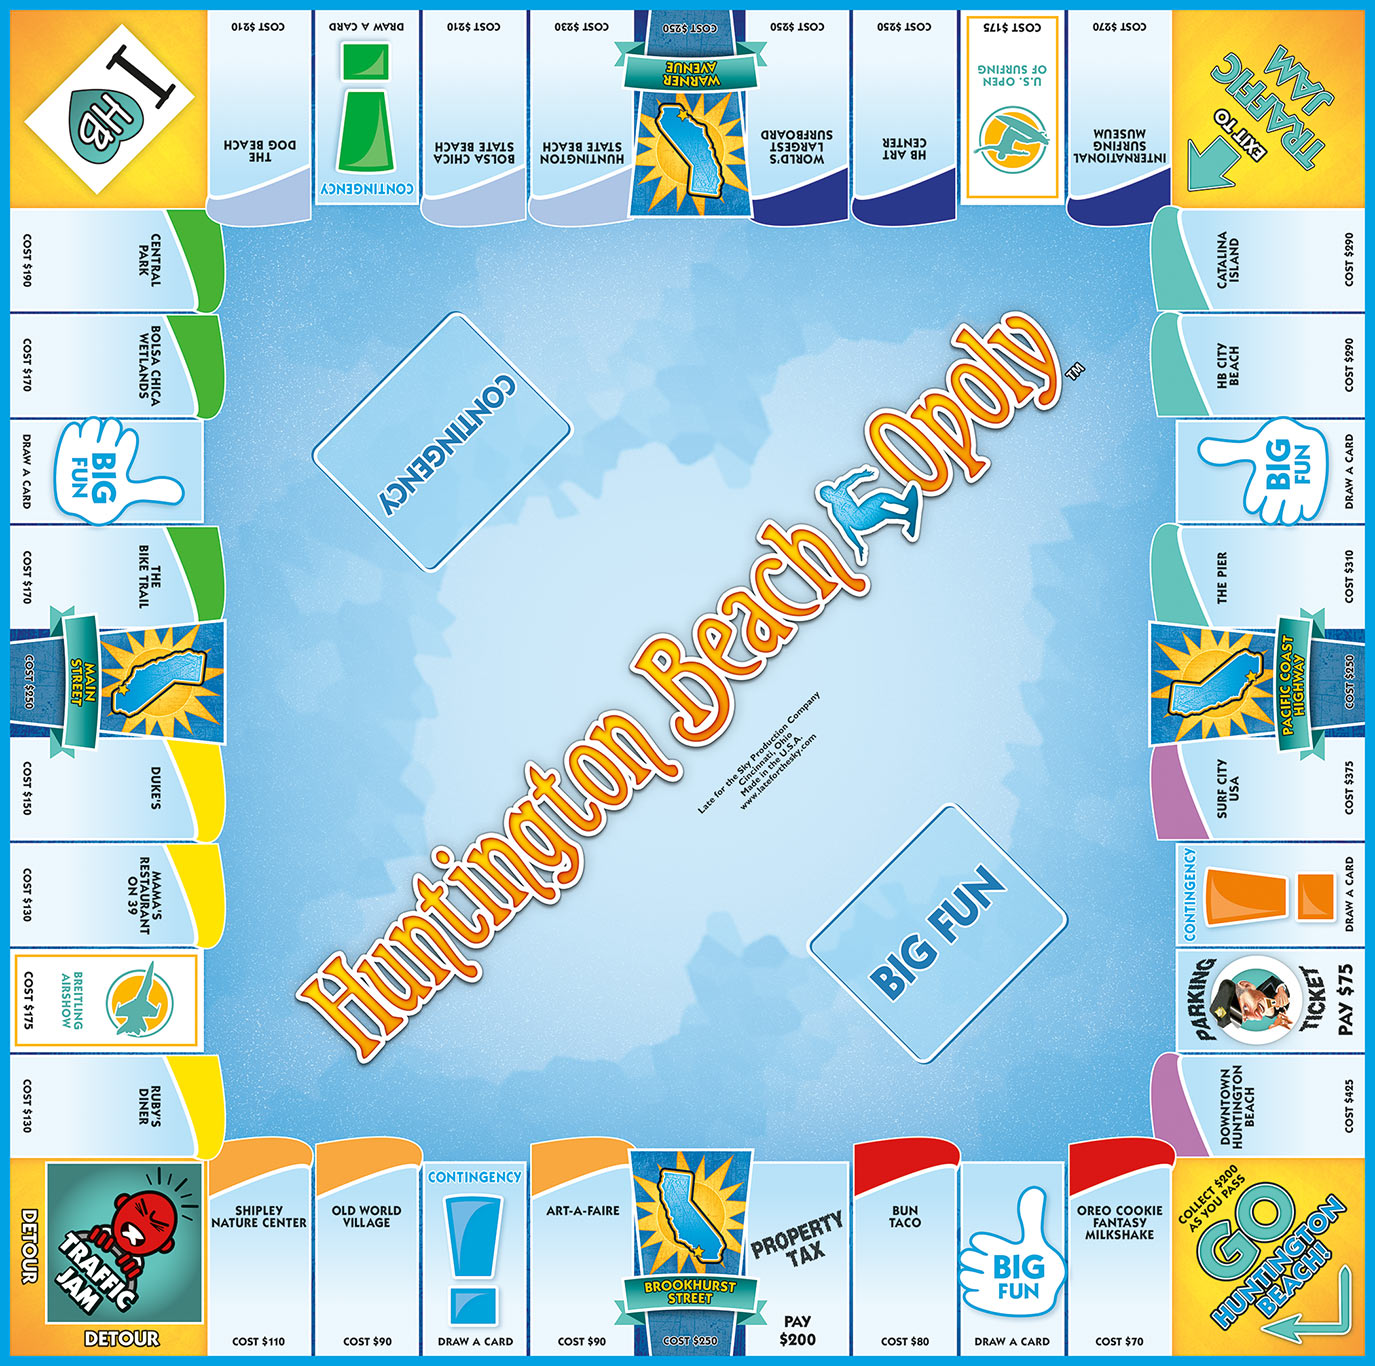 HUNTINGTON BEACH-OPOLY Board Game